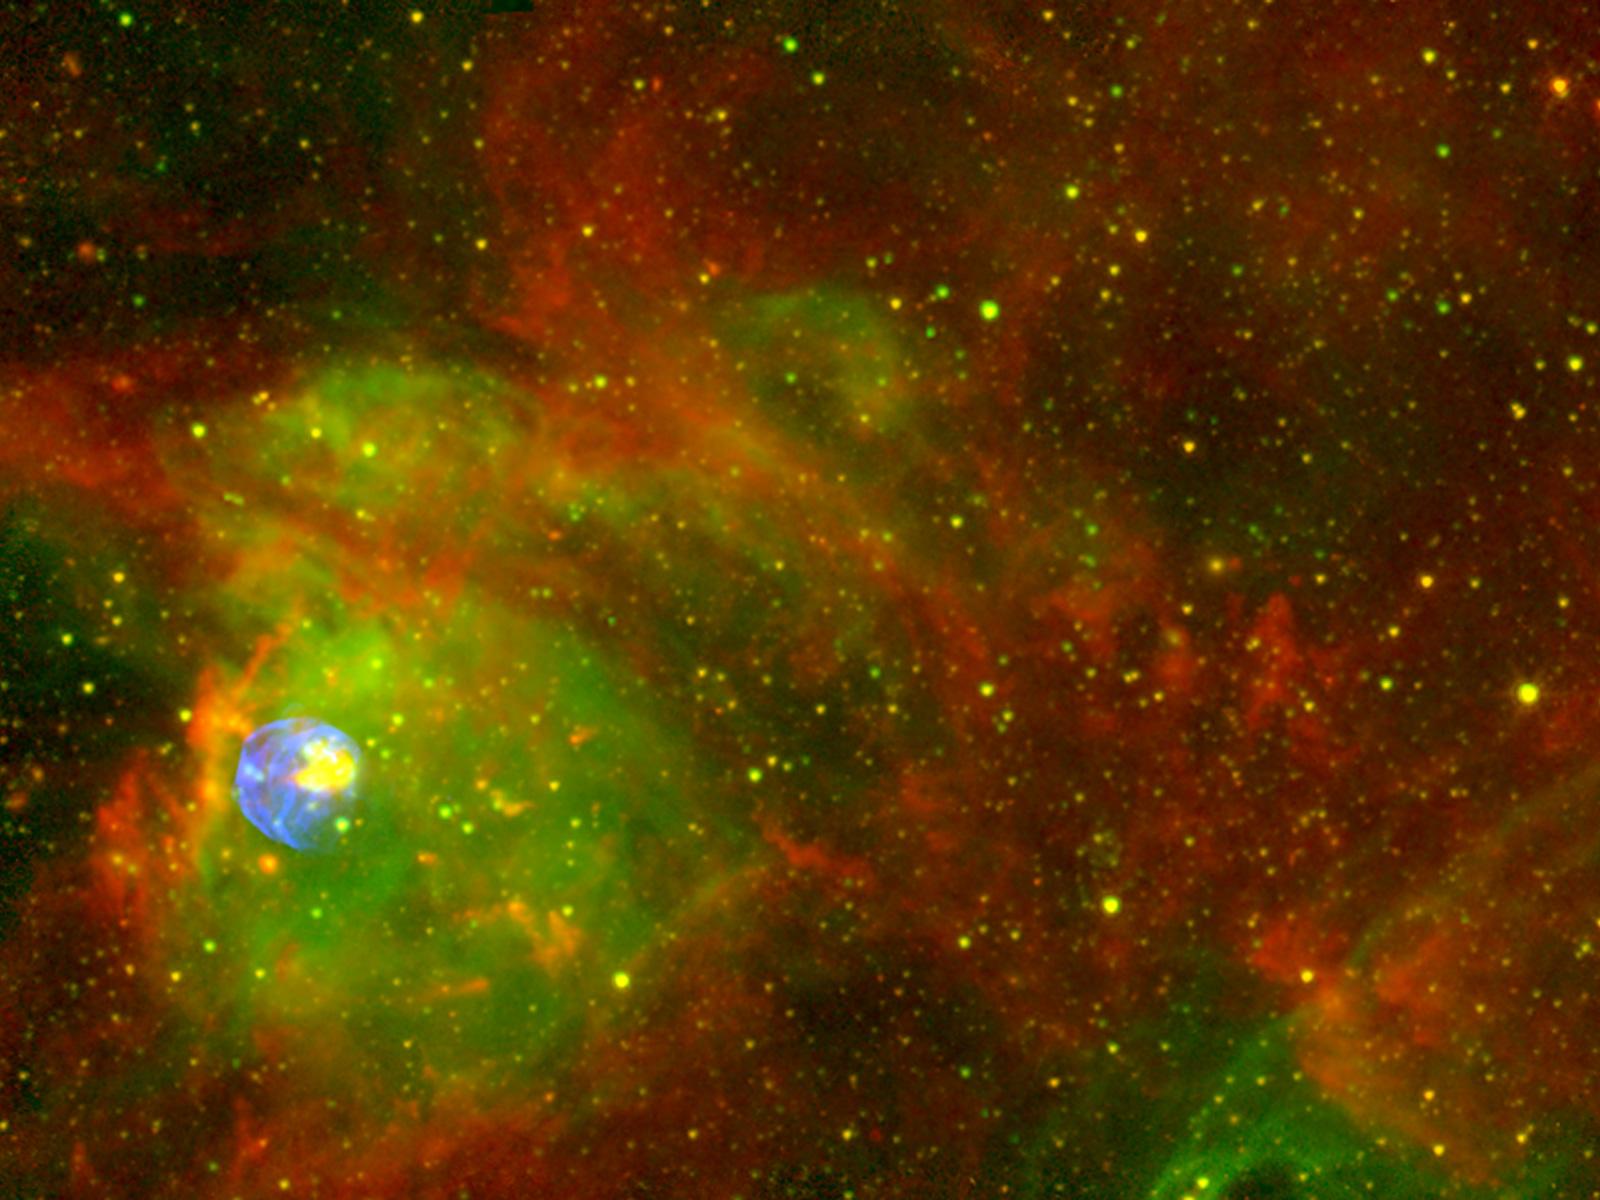 Space Hubble Wallpaper 1600x1200